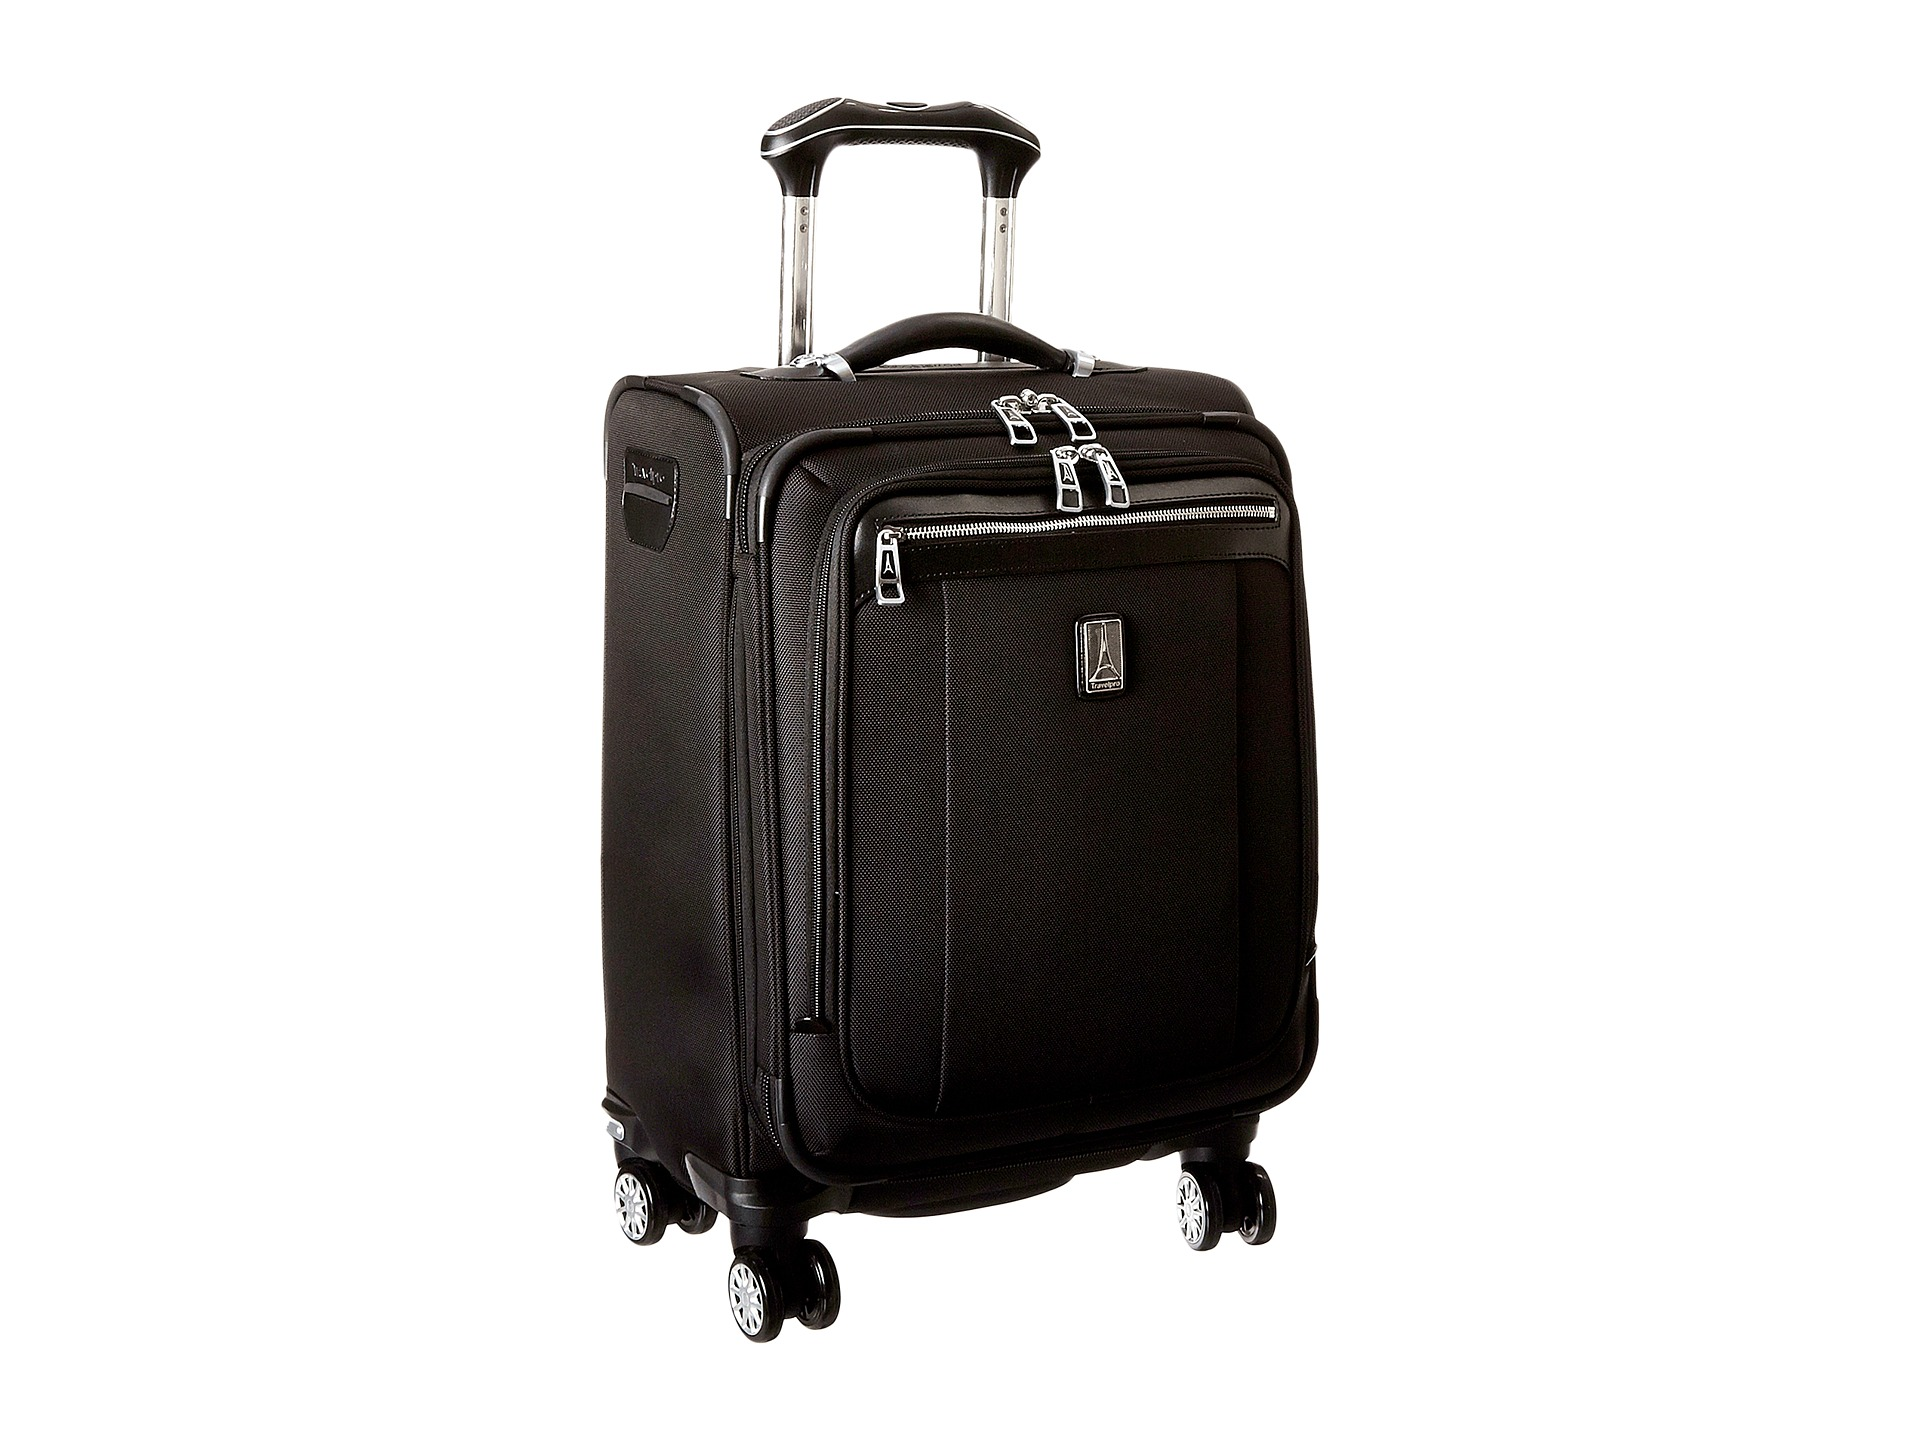 Travelpro parts - Saddleback golf club